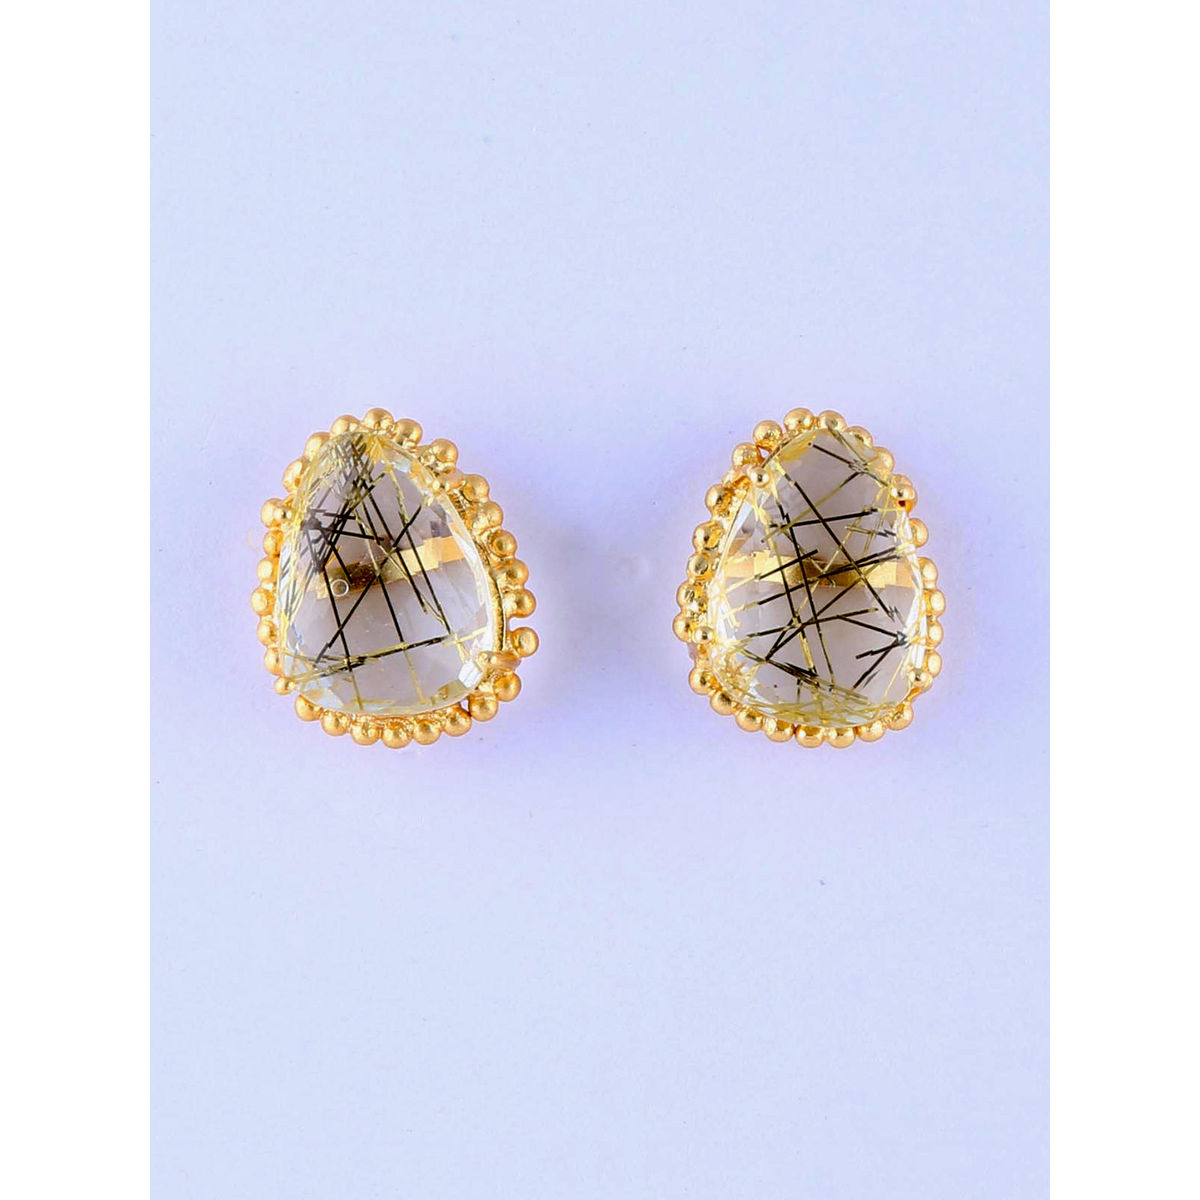 Woila Jaune Earrings